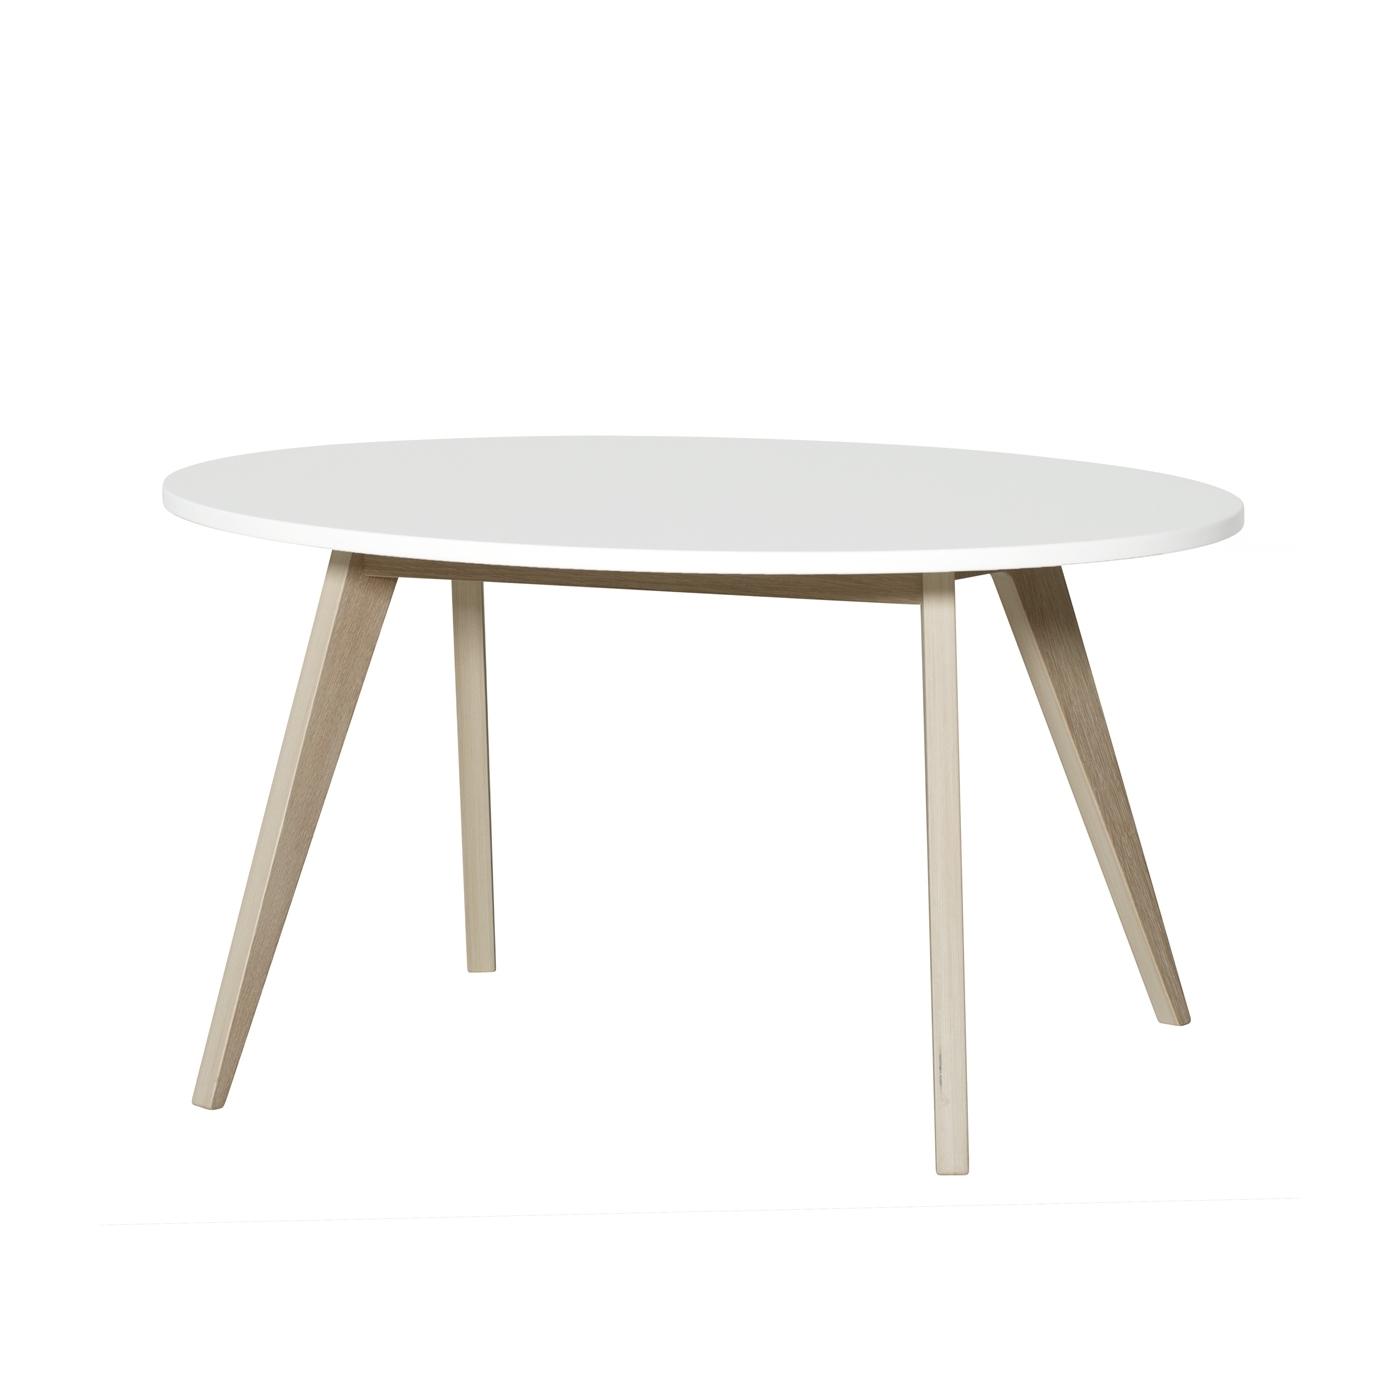 Barnbord PingPong Wood vit/ ek, Oliver Furniture